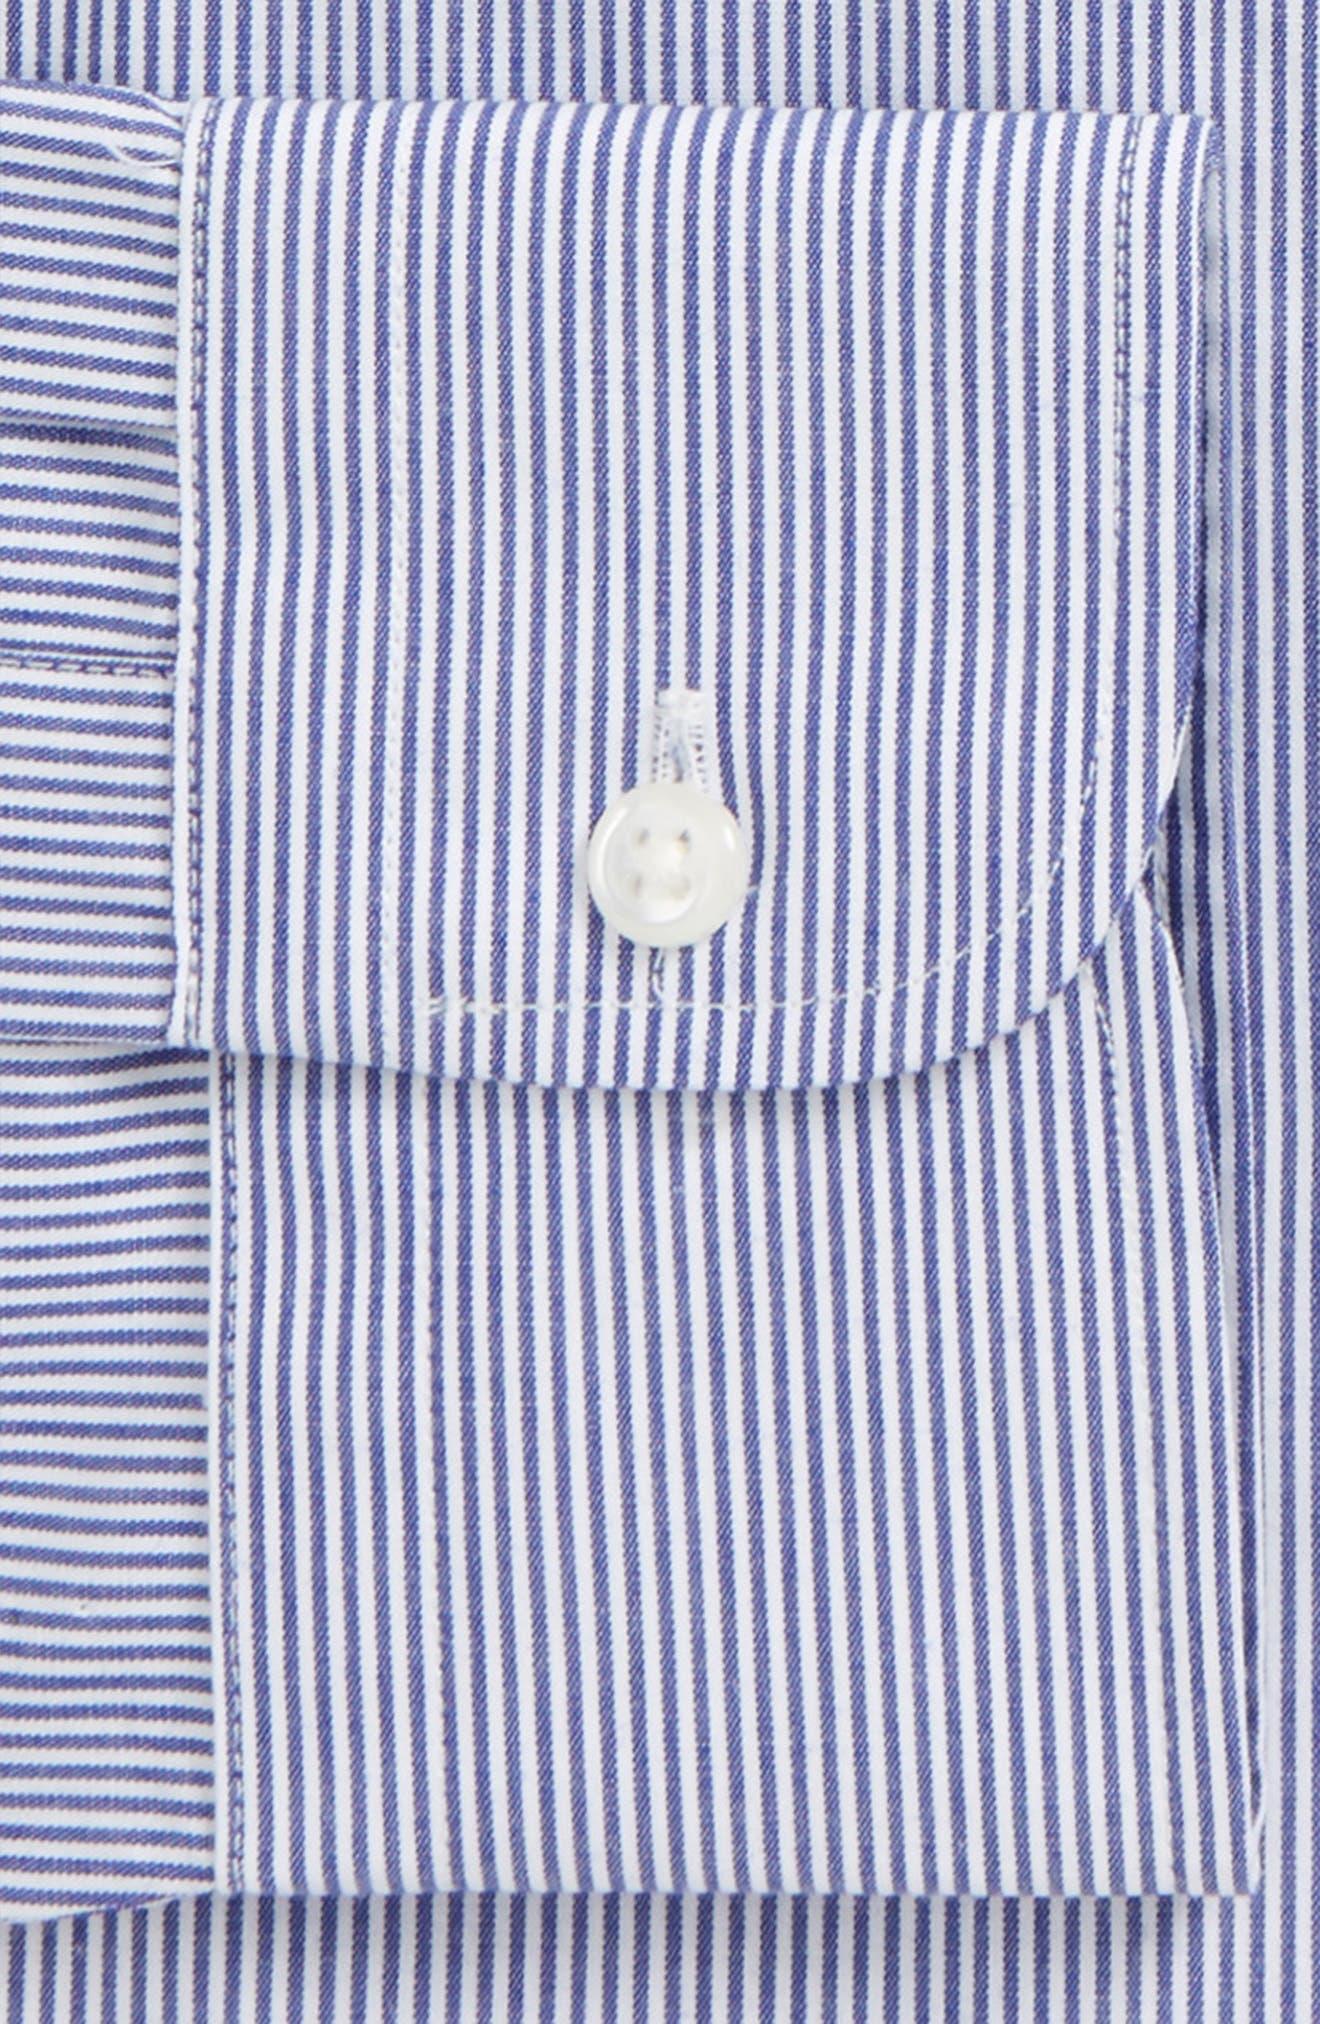 Classic Fit Non-Iron Stripe Dress Shirt,                             Alternate thumbnail 5, color,                             Navy Dusk